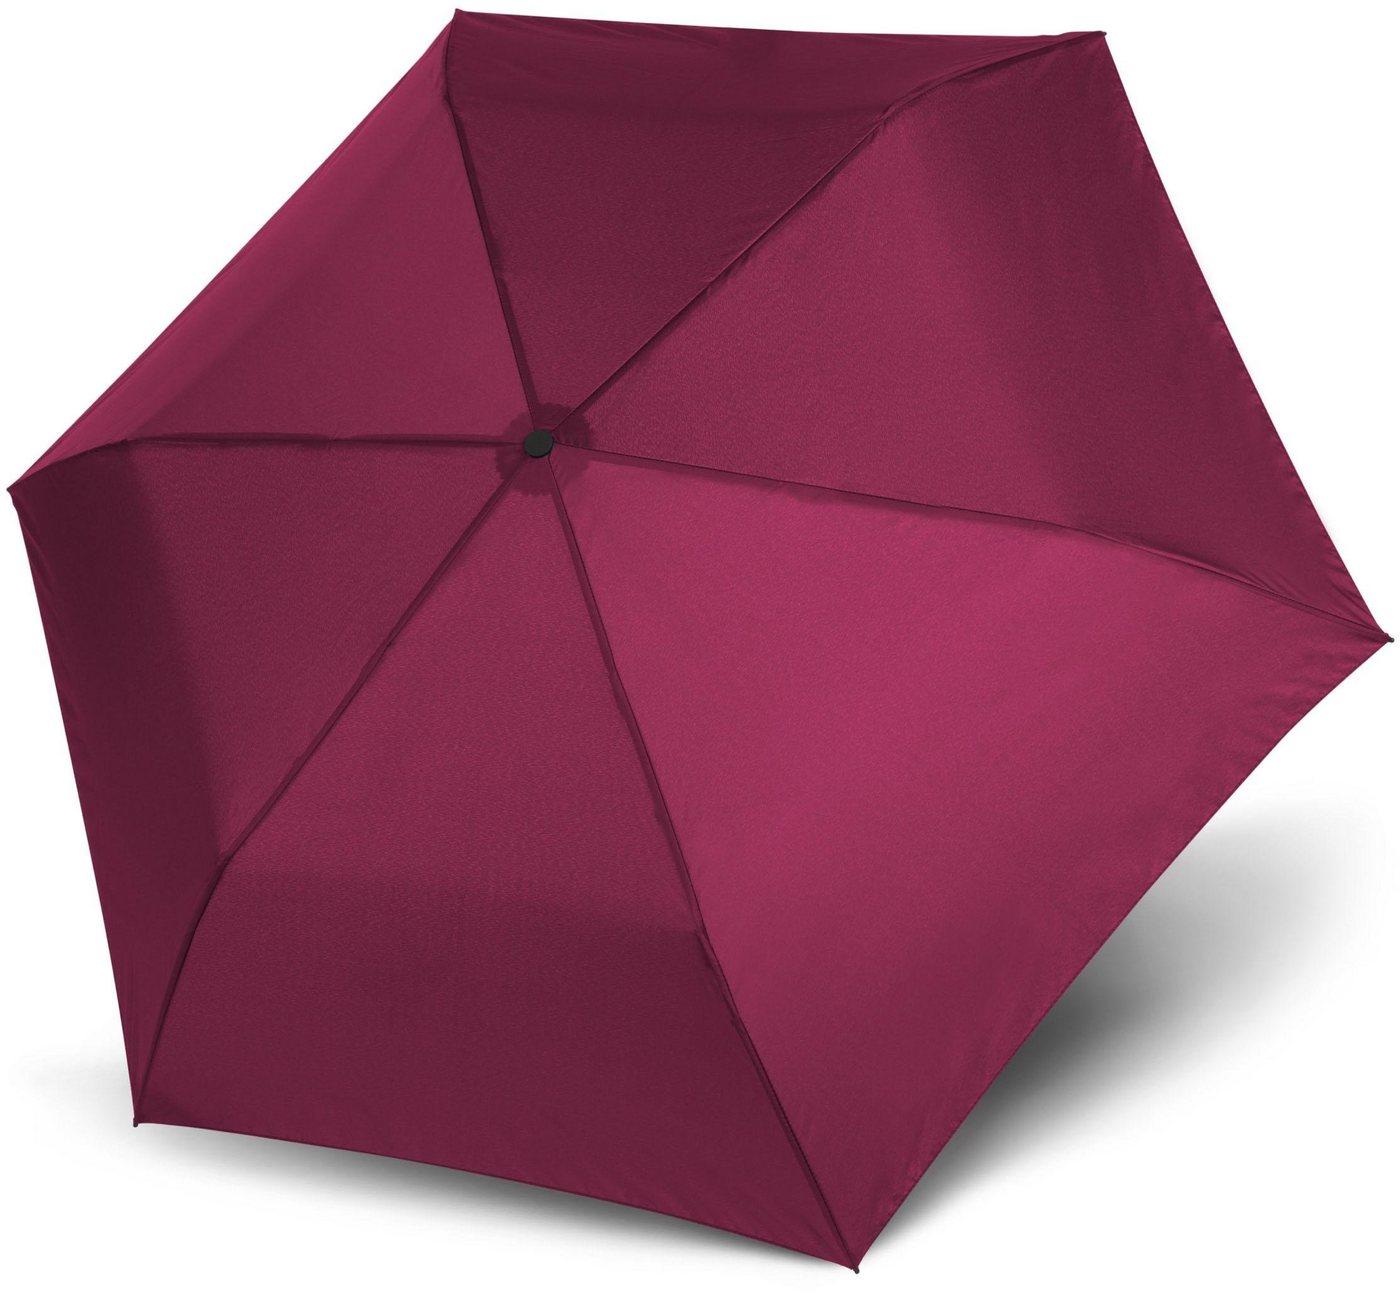 Regenschirme - doppler® Taschenregenschirm »Zero 99 uni, Royal Berry« ›  - Onlineshop OTTO